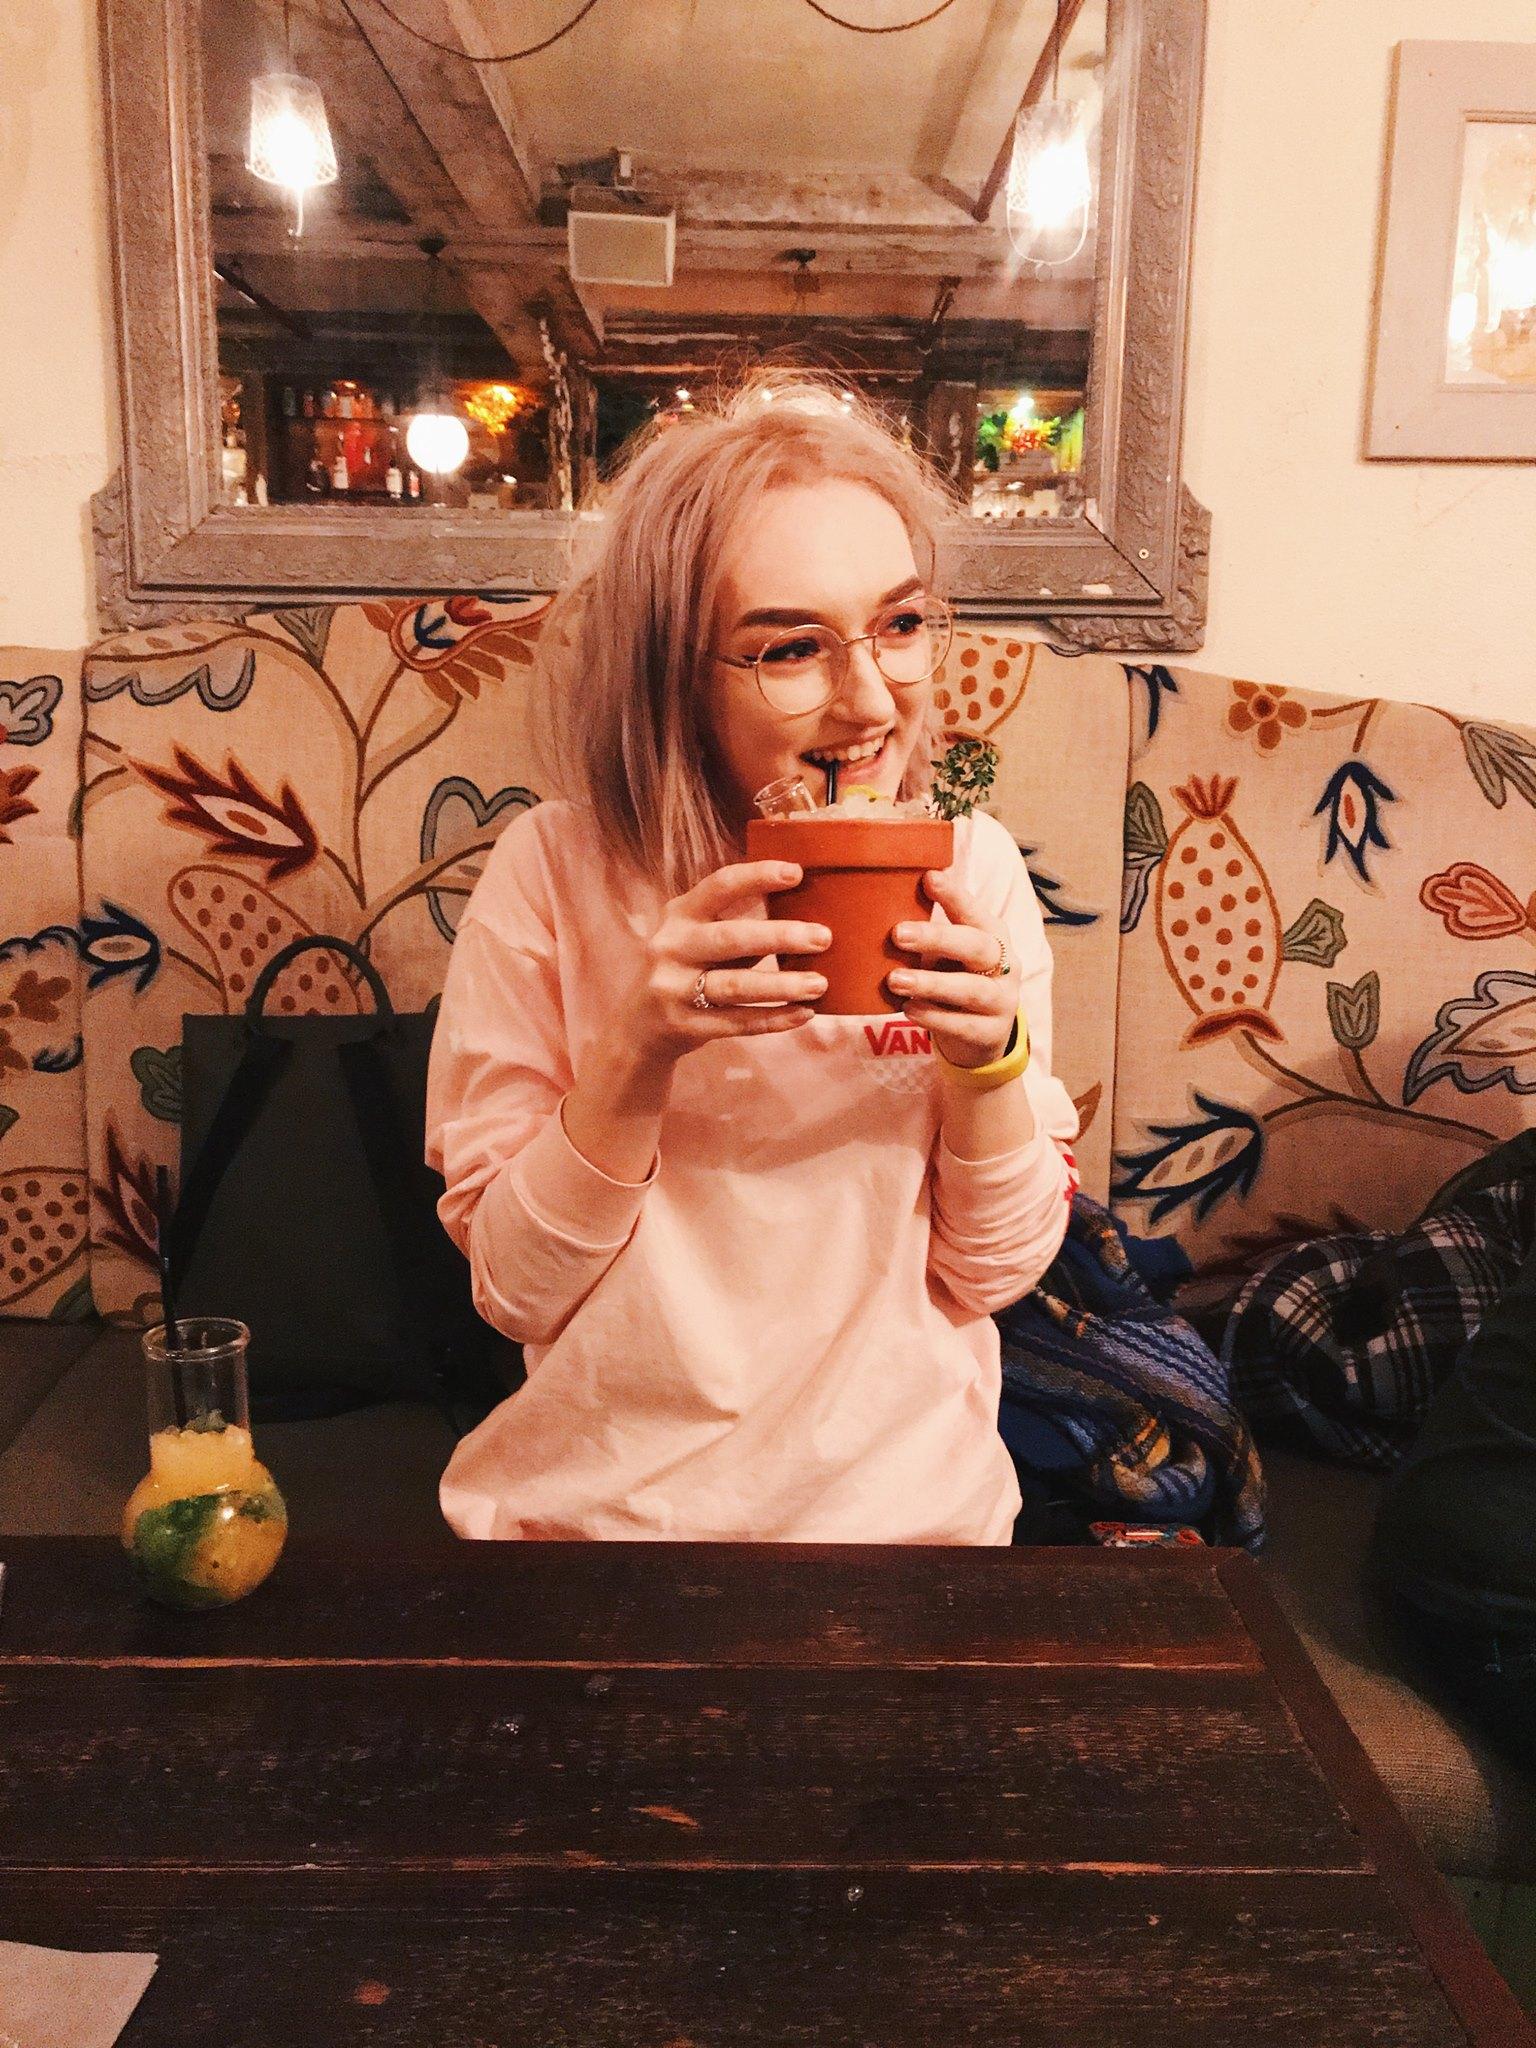 Hayley fearnley - photographer / writer -